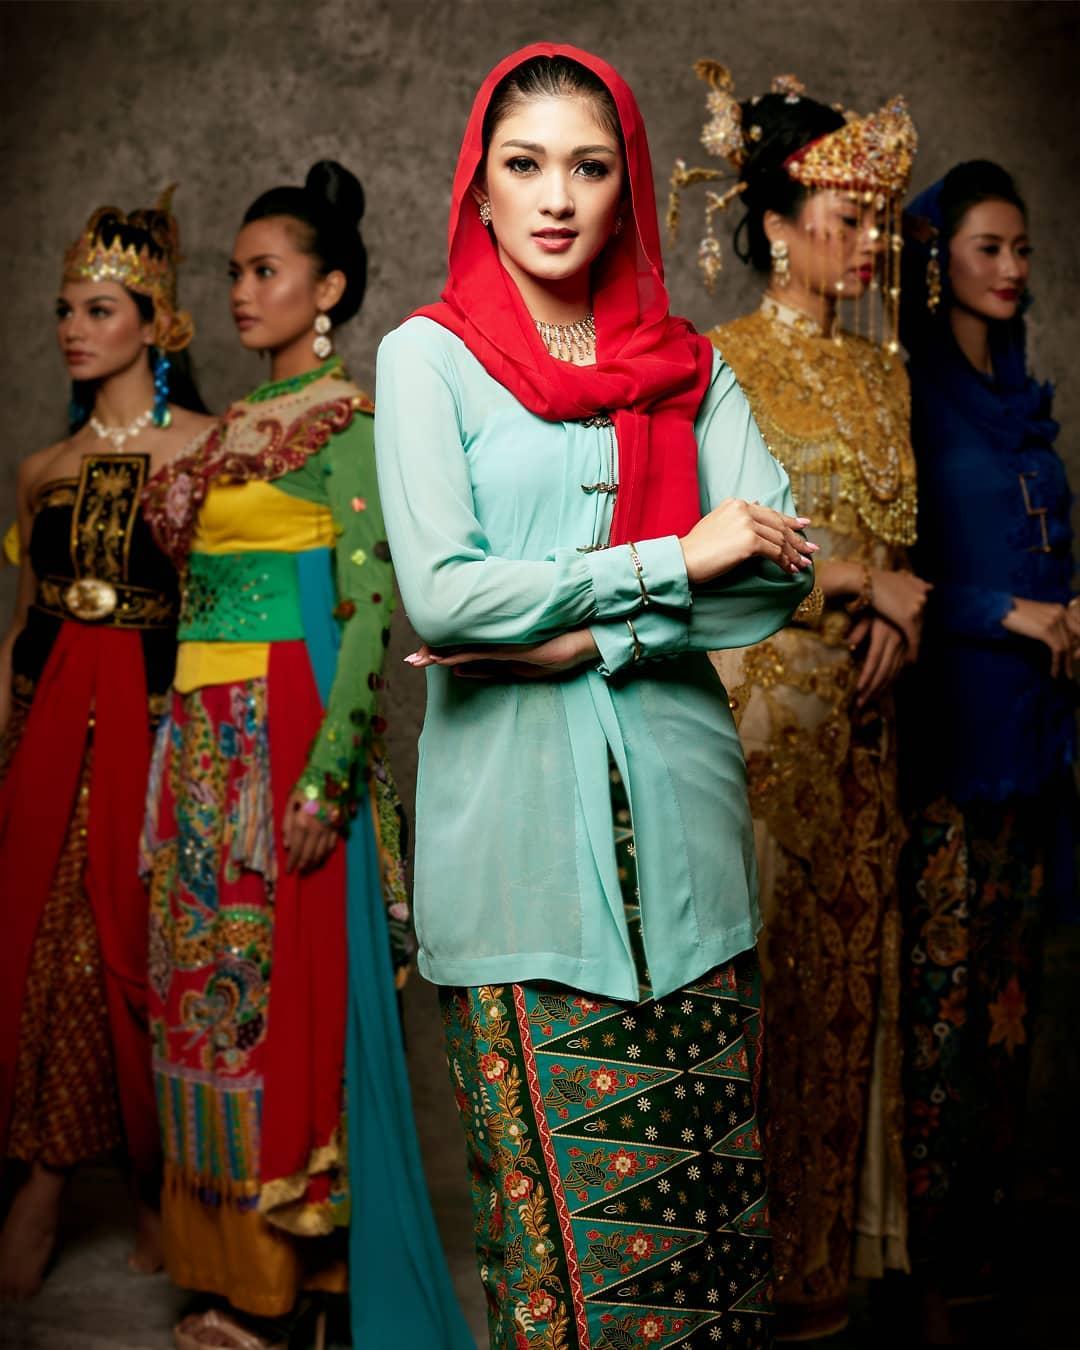 Baju adat Indonesia - Finalis Puteri Indonesia asal DKI Jakarta 1